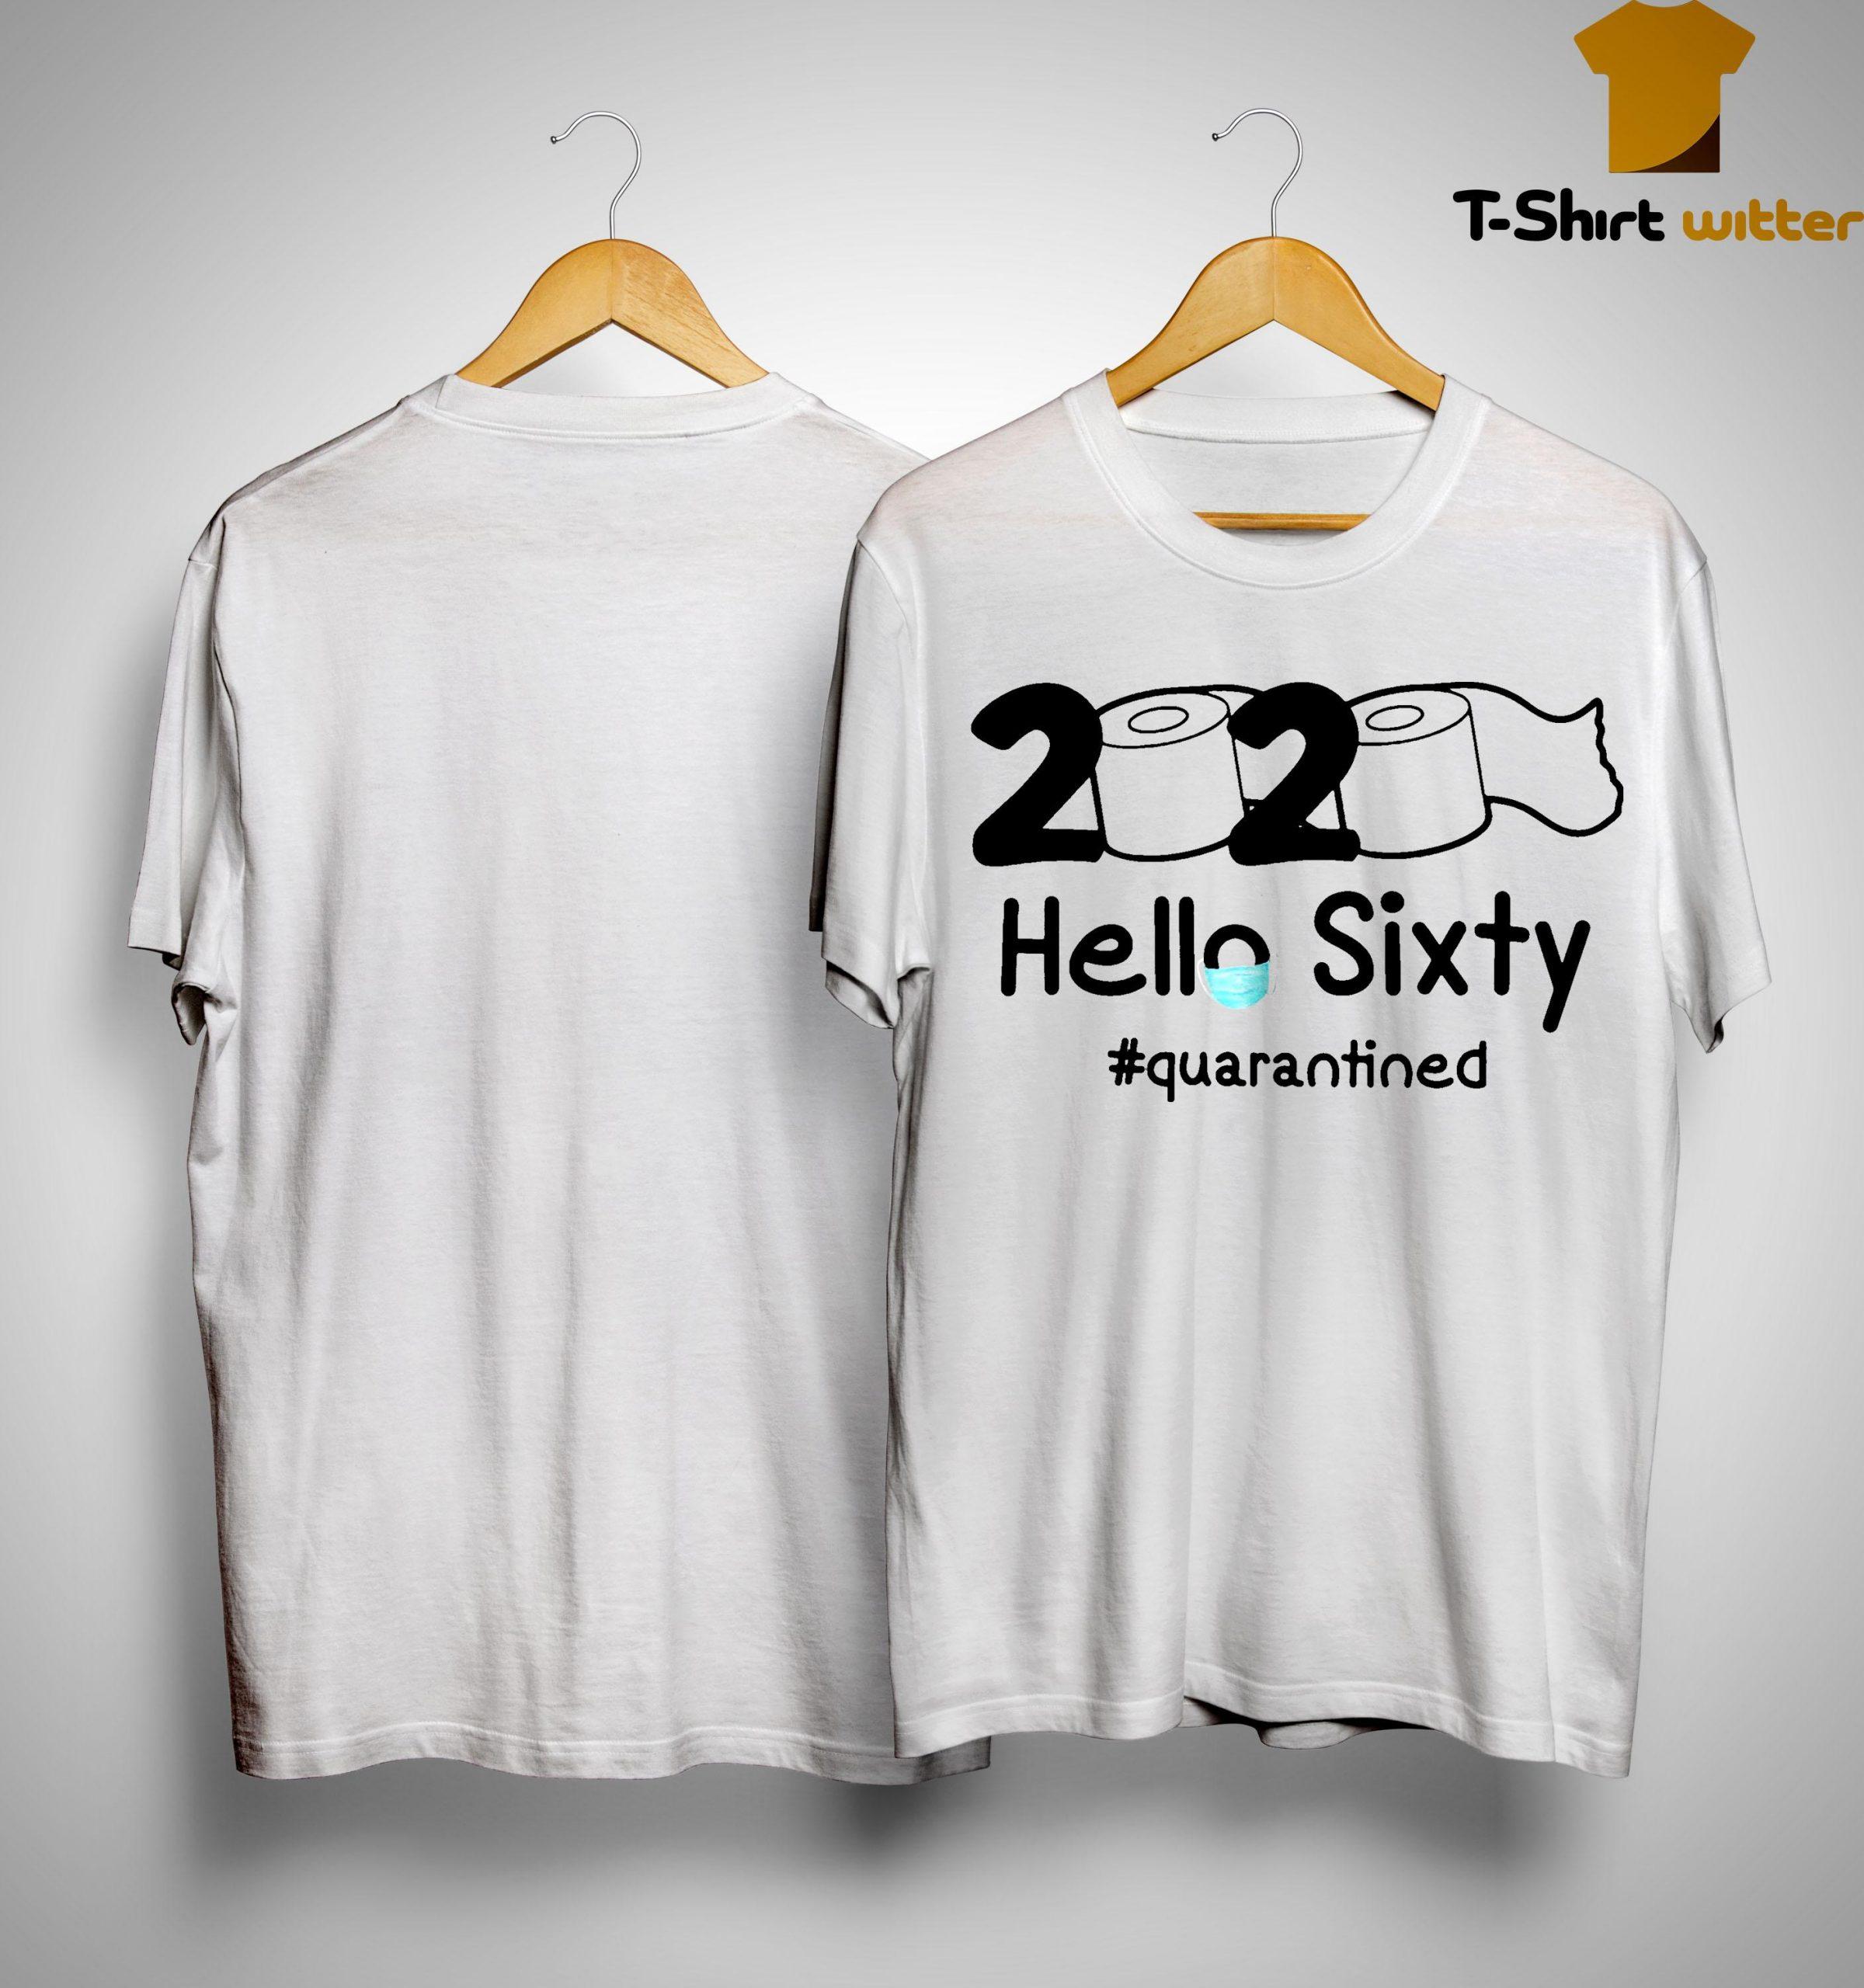 2020 Hello Sixty #quarantined Shirt